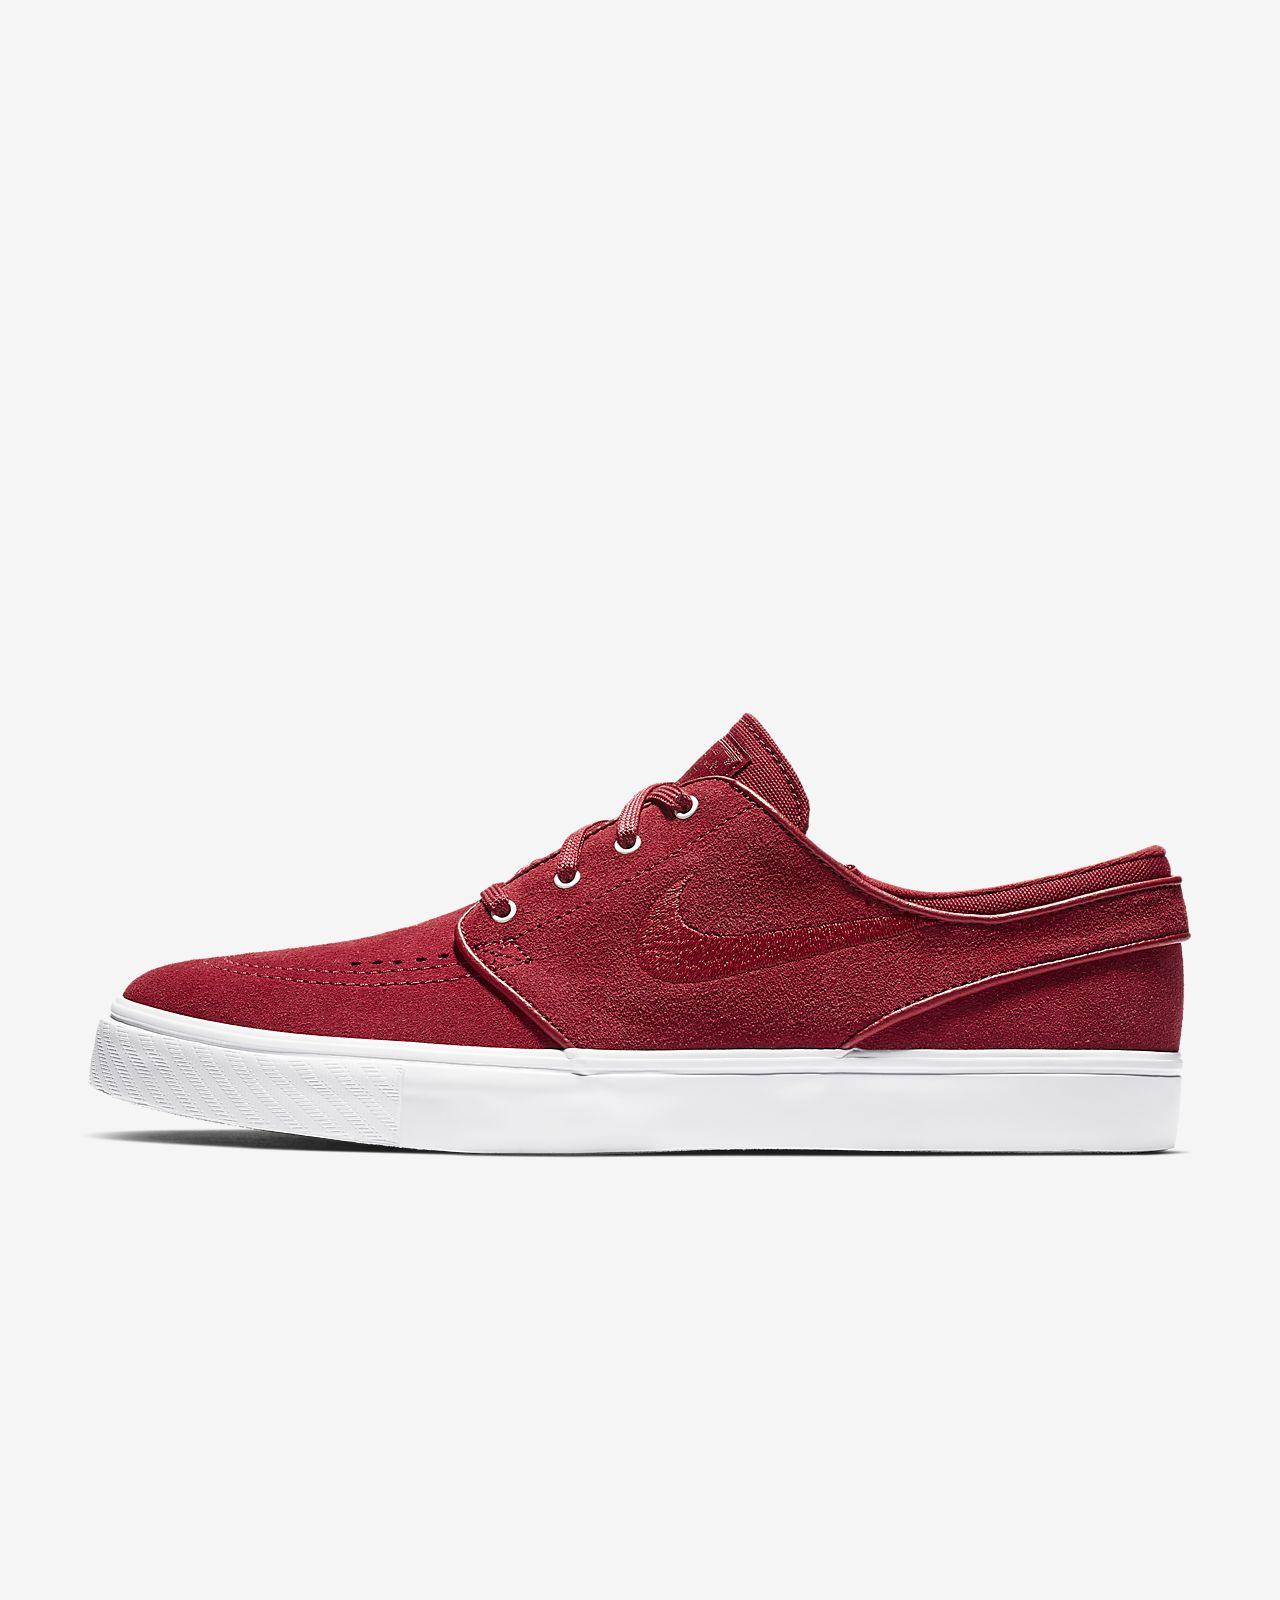 Nike Zoom Stefan Janoski Men's Skate Shoe